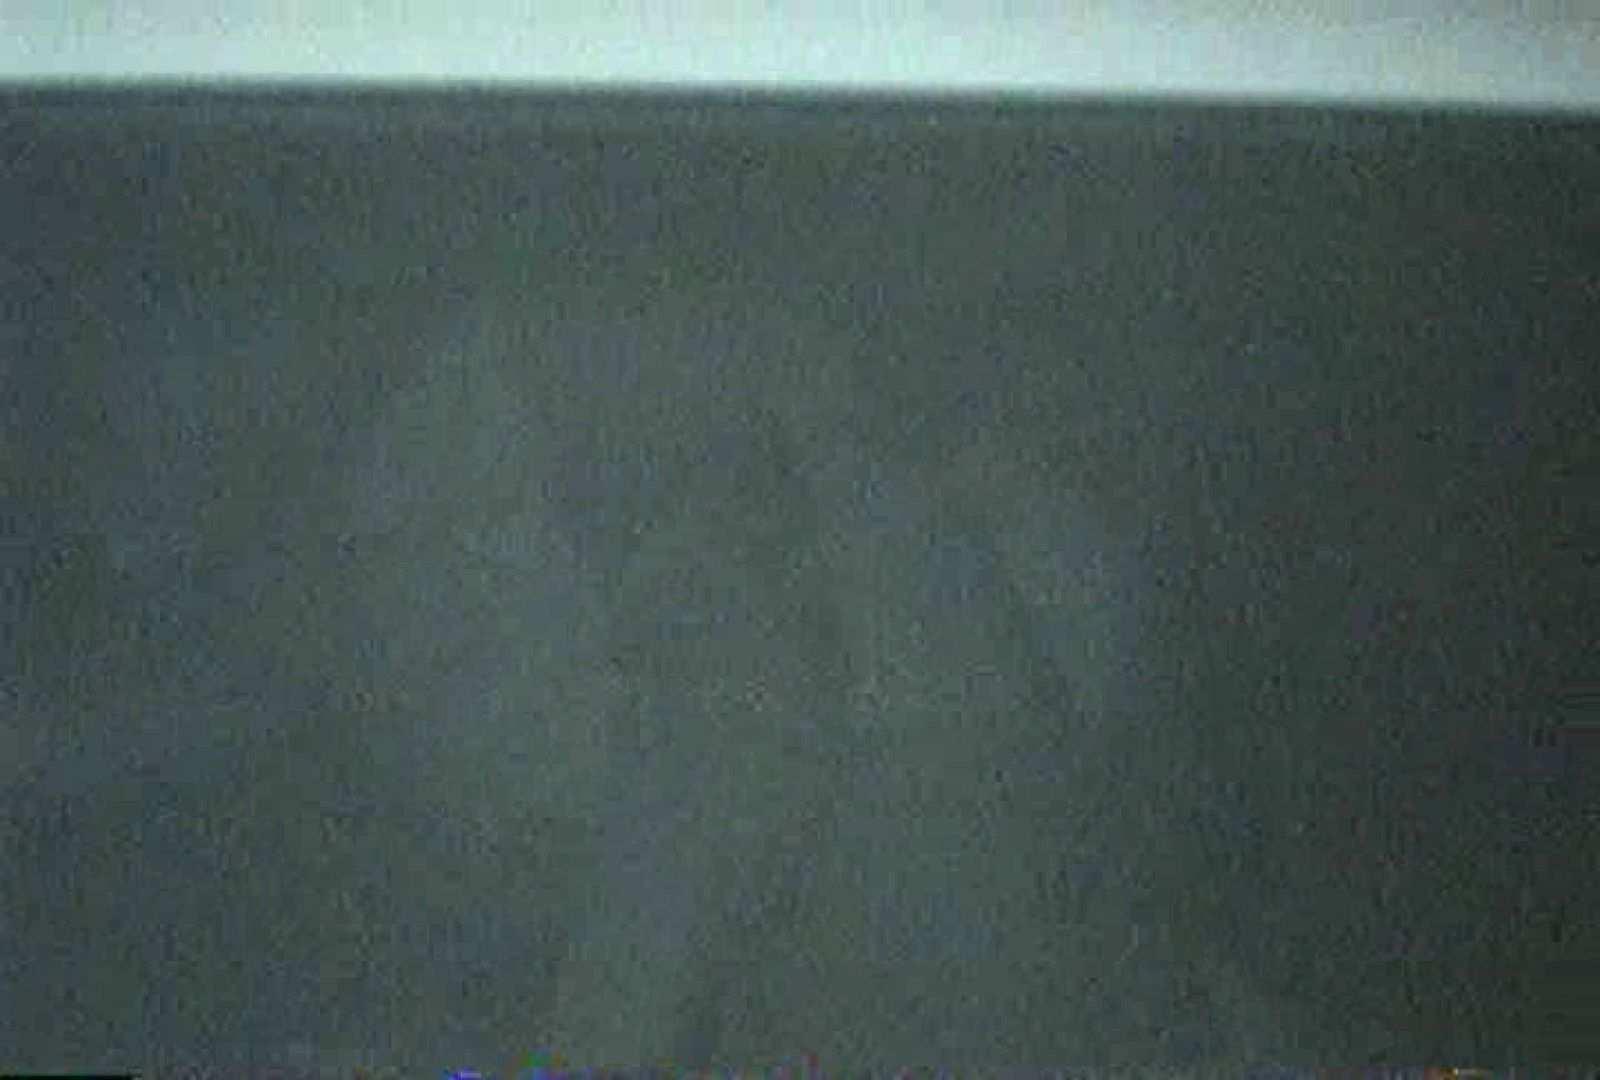 充血監督の深夜の運動会Vol.114 淫乱 セックス無修正動画無料 97画像 5